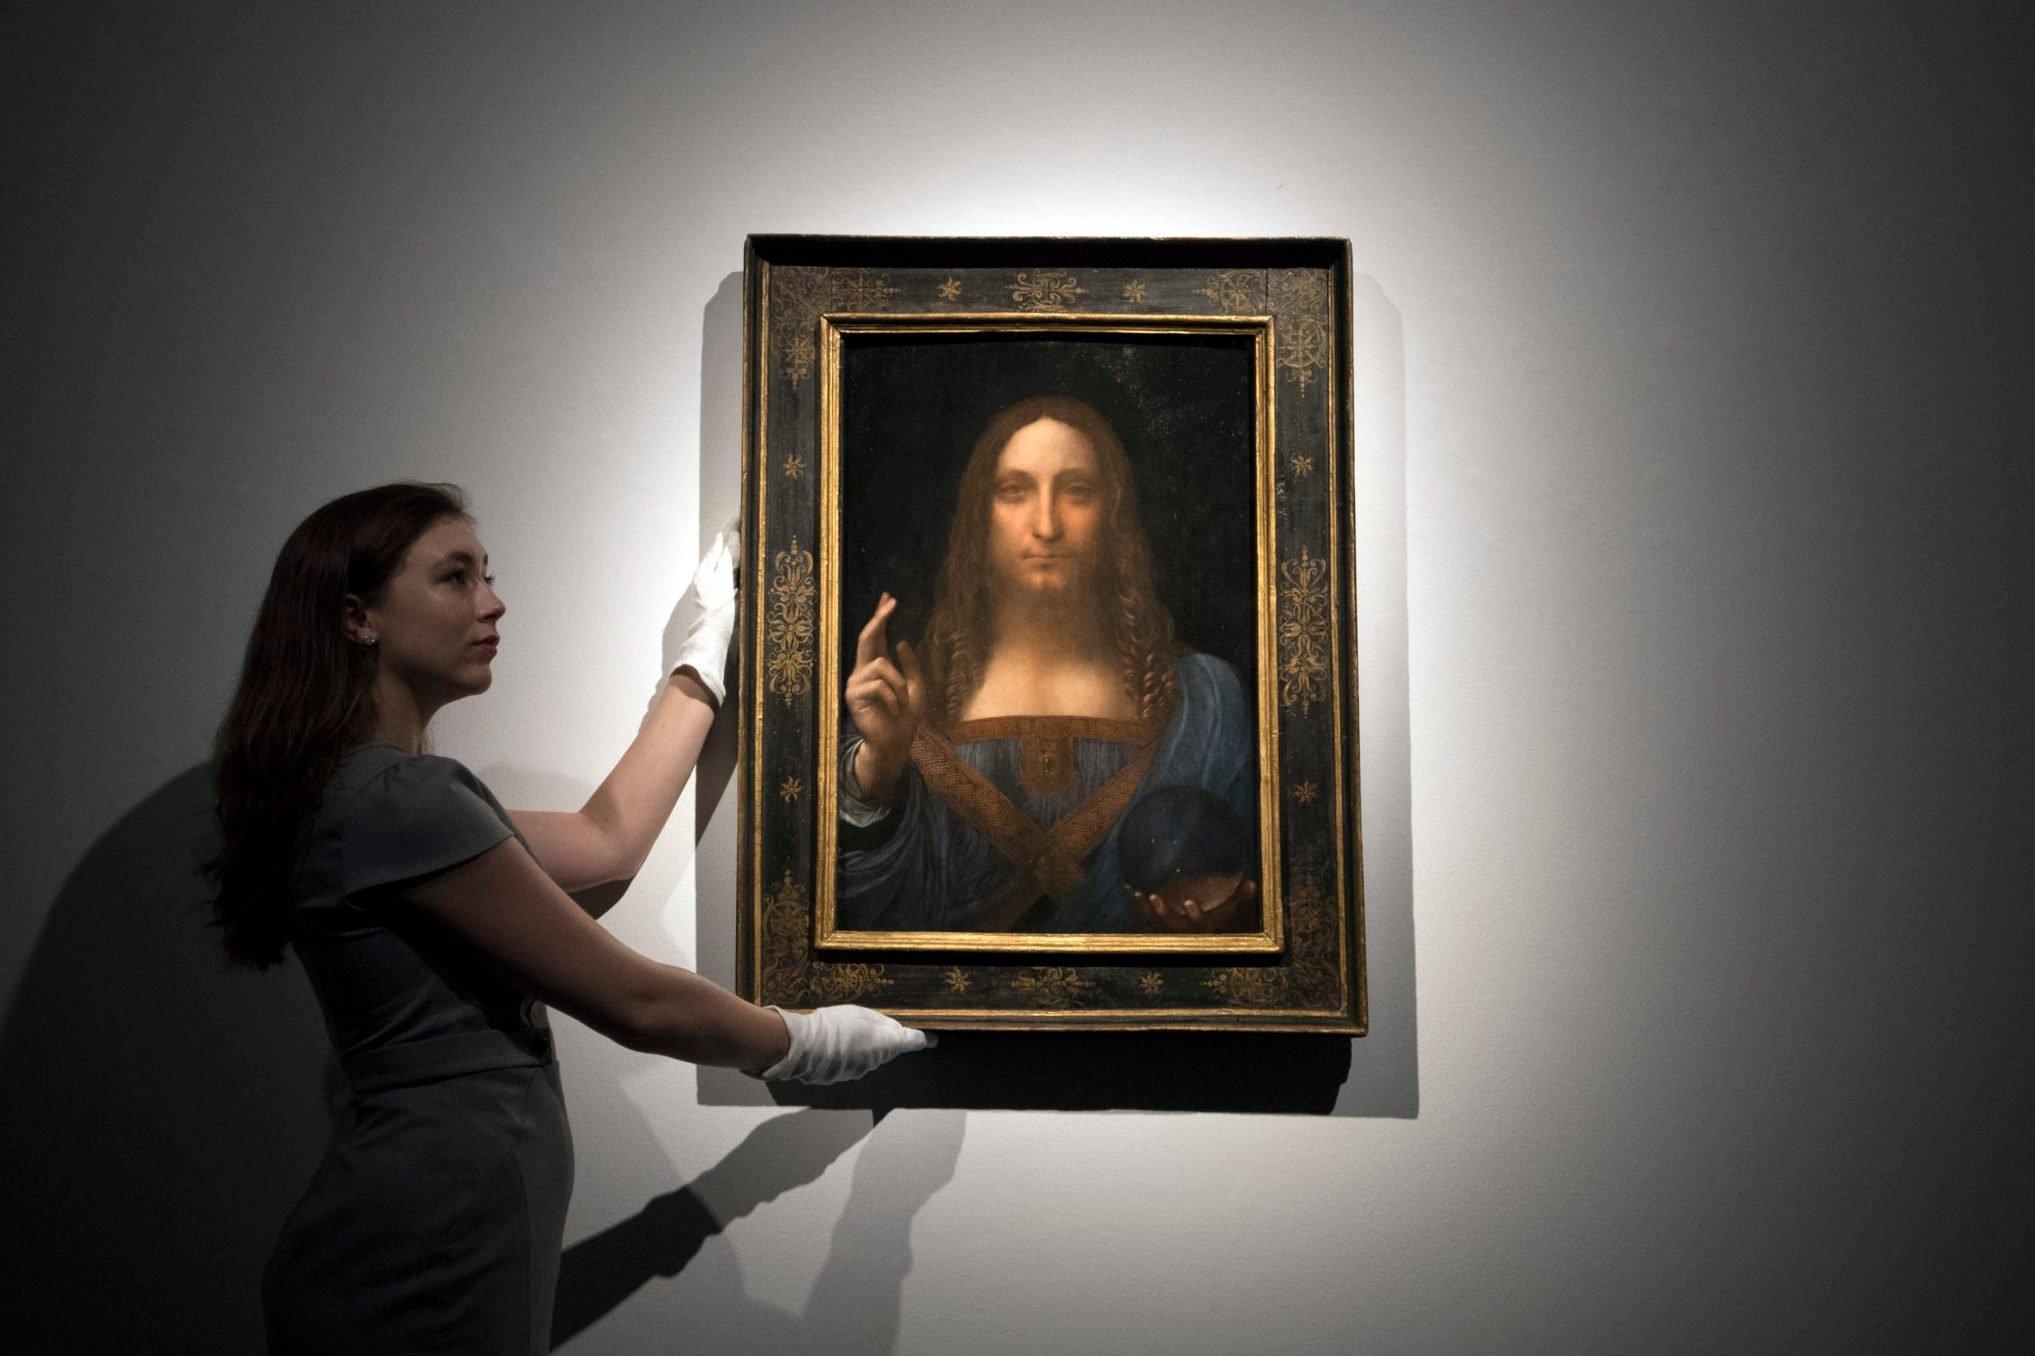 Christie's Previews Leonardo Da Vinci's Salvator Mundi Prior To Auction